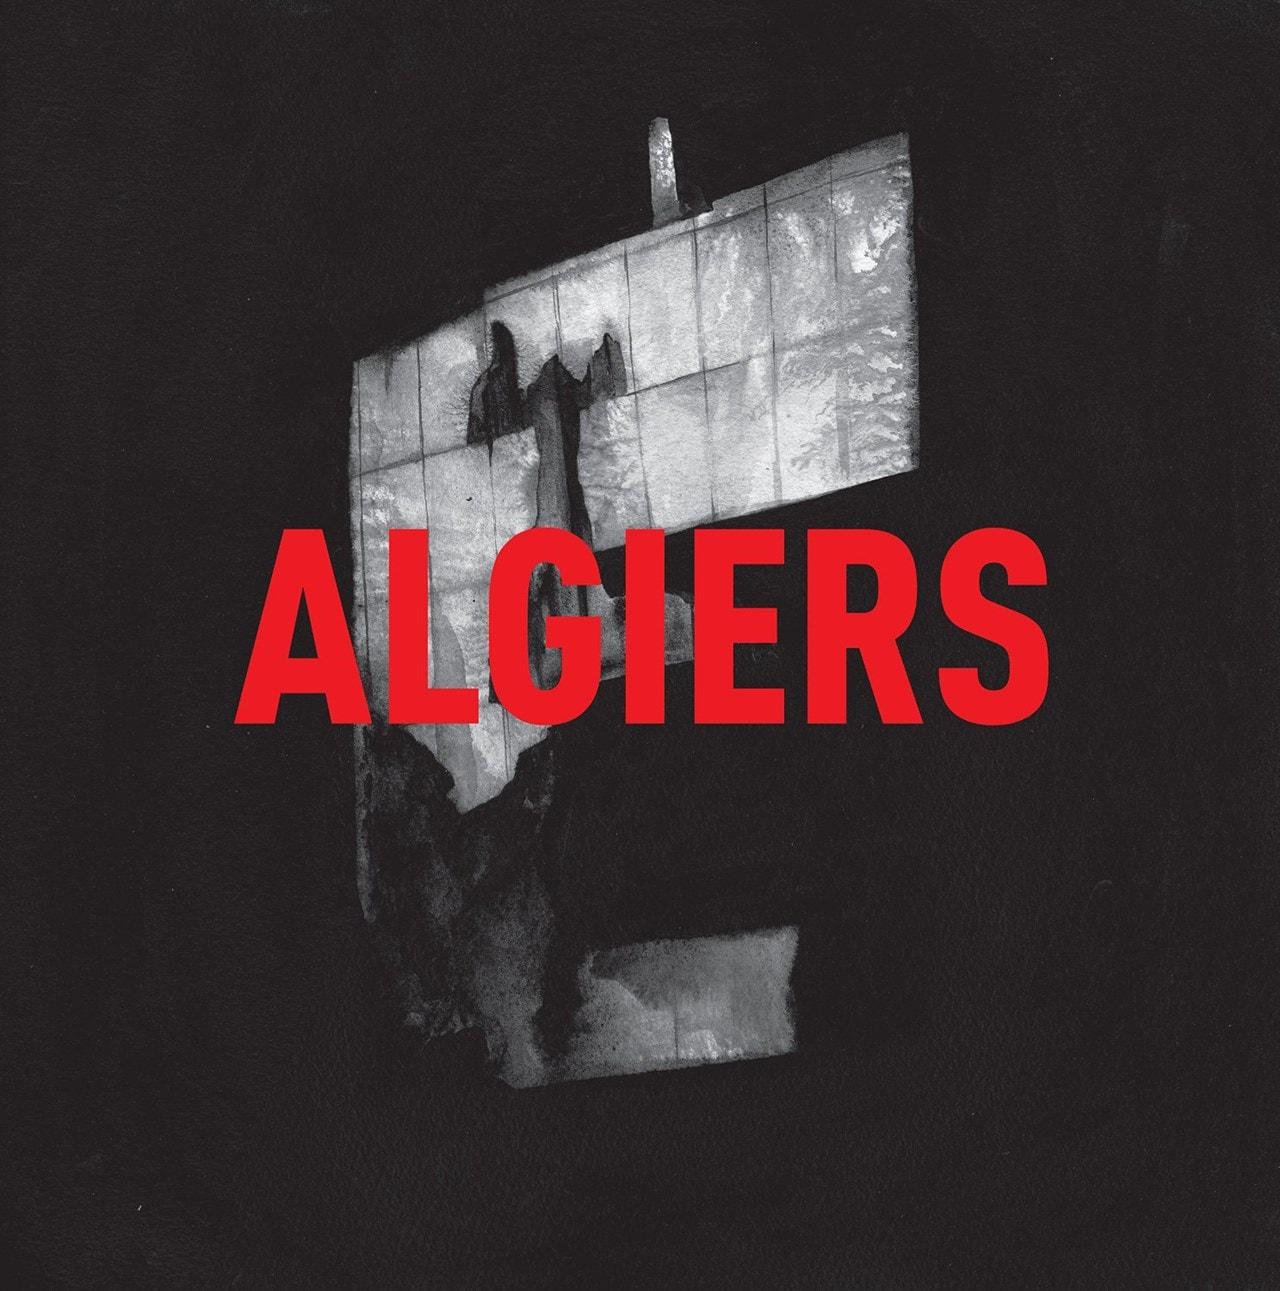 Algiers - 1